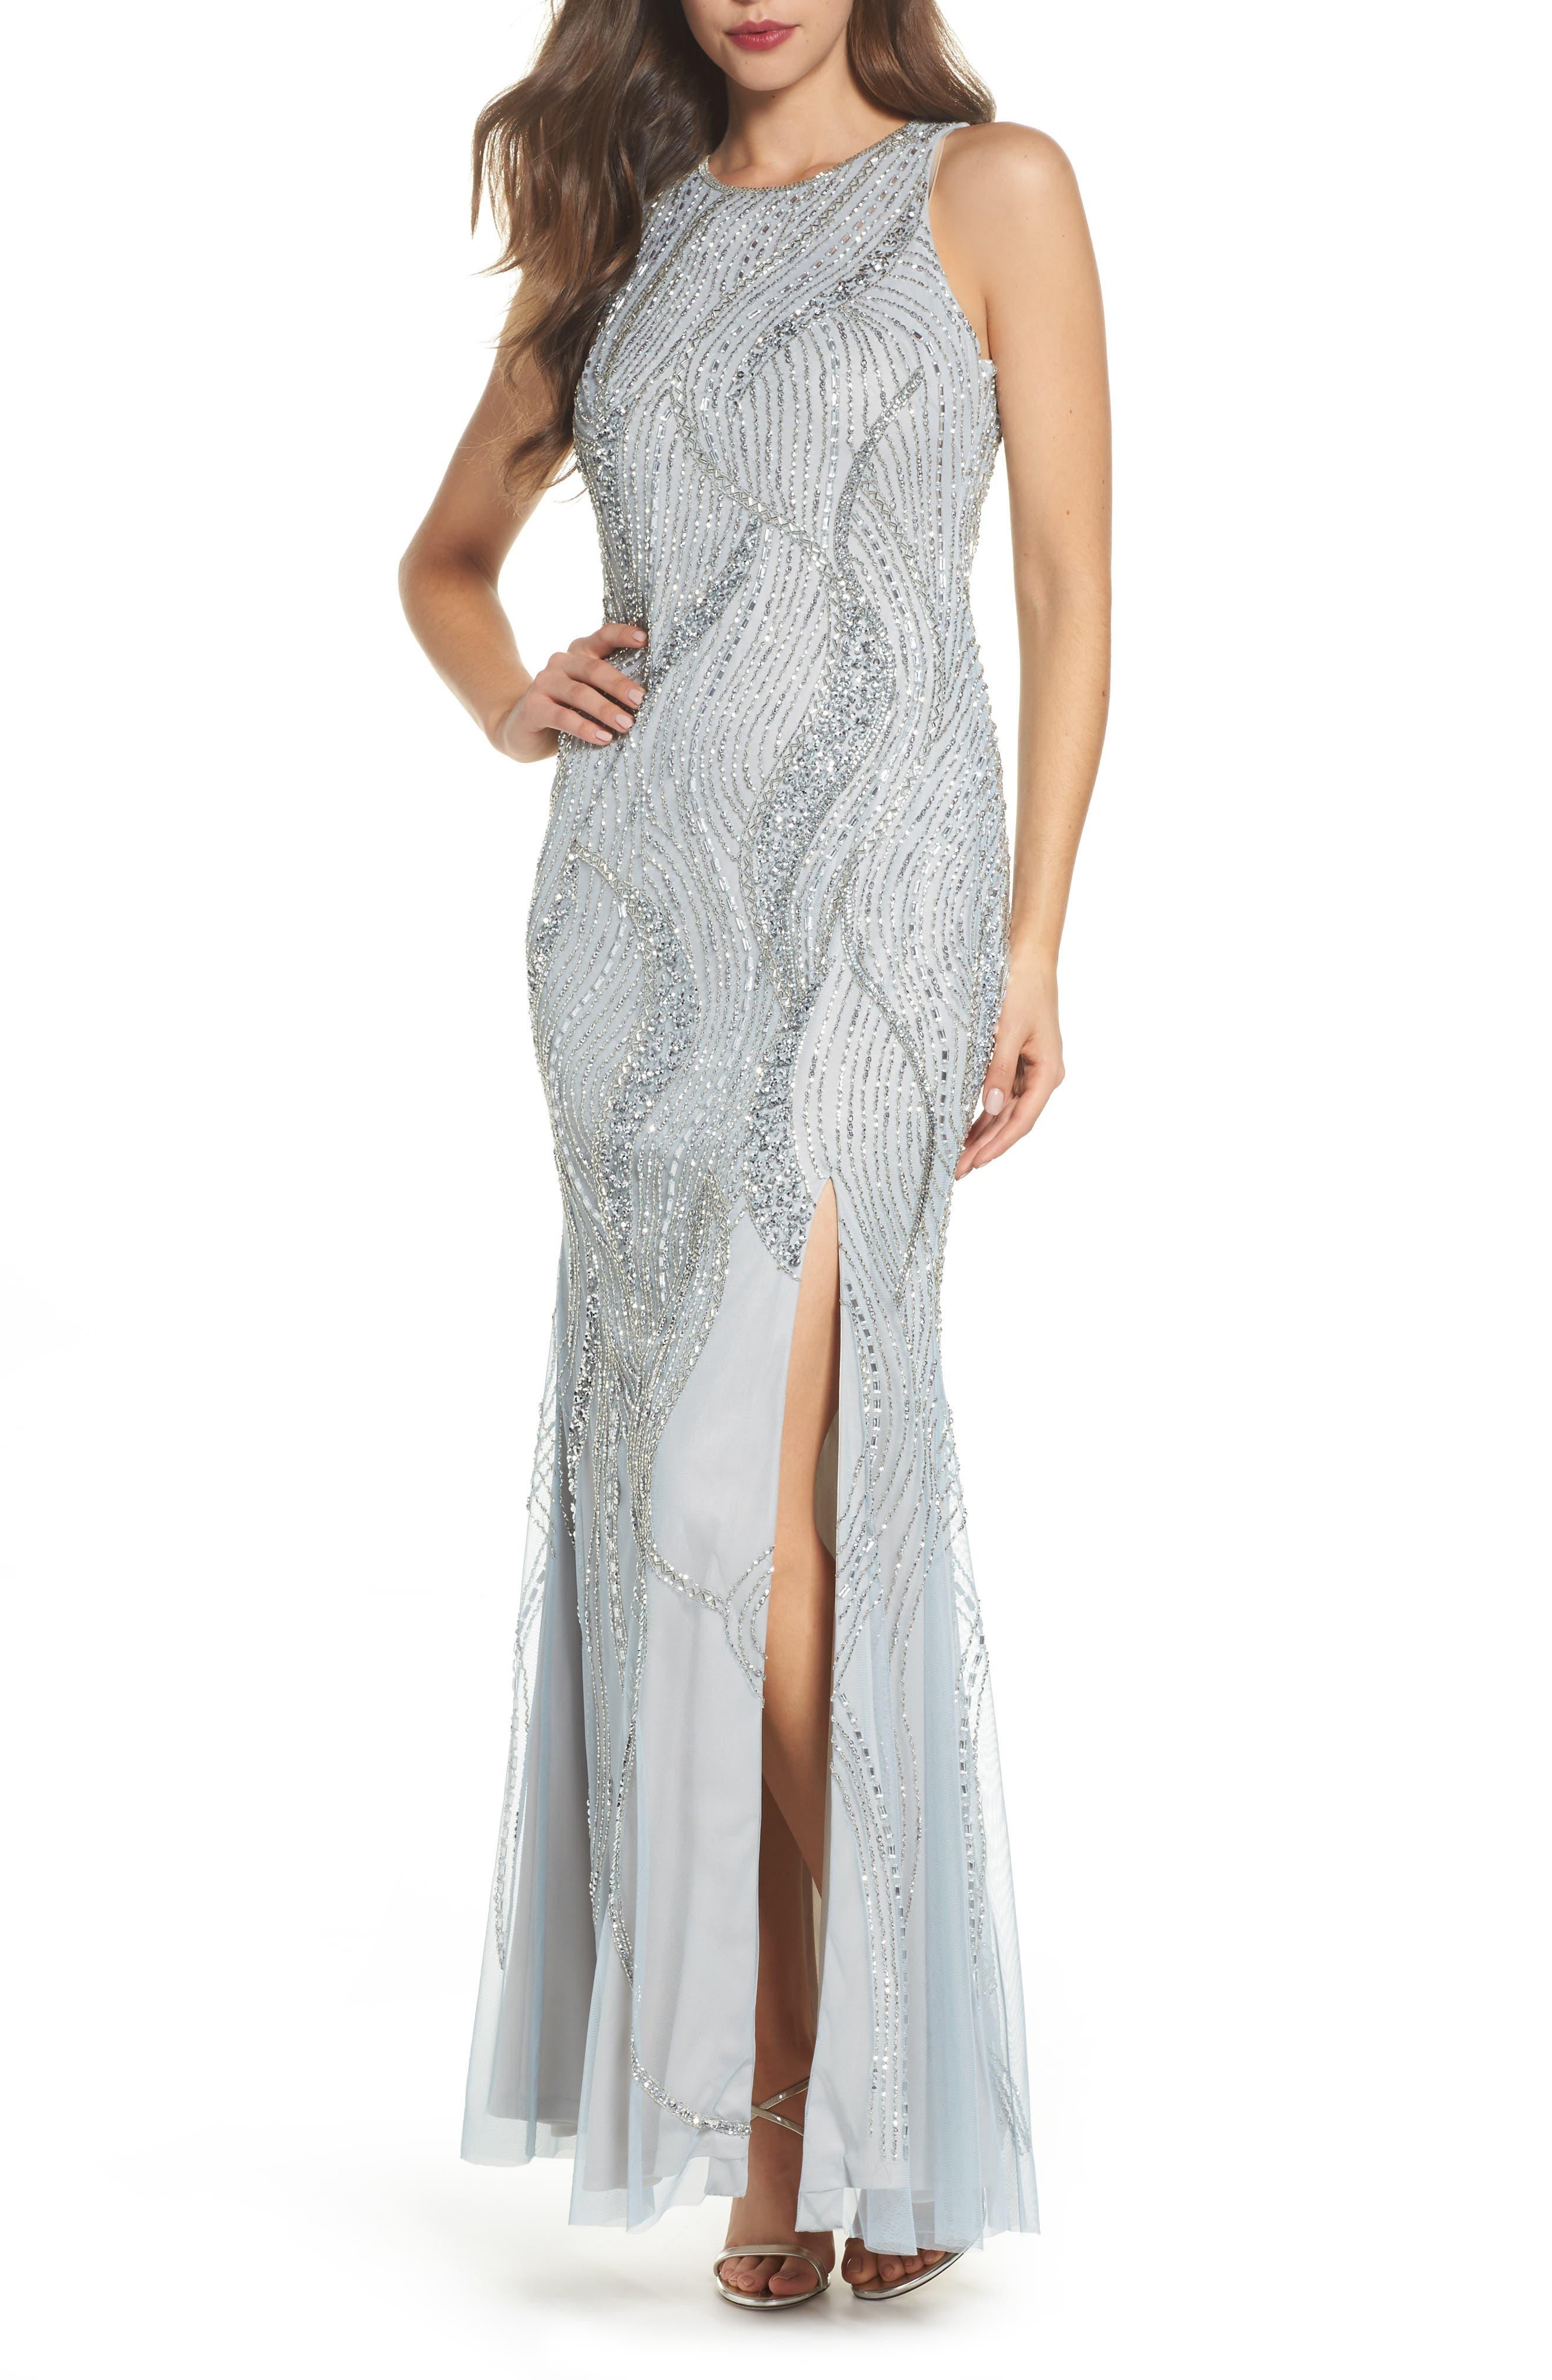 Main Image - Adrianna Papell Swirl Beaded Long Dress